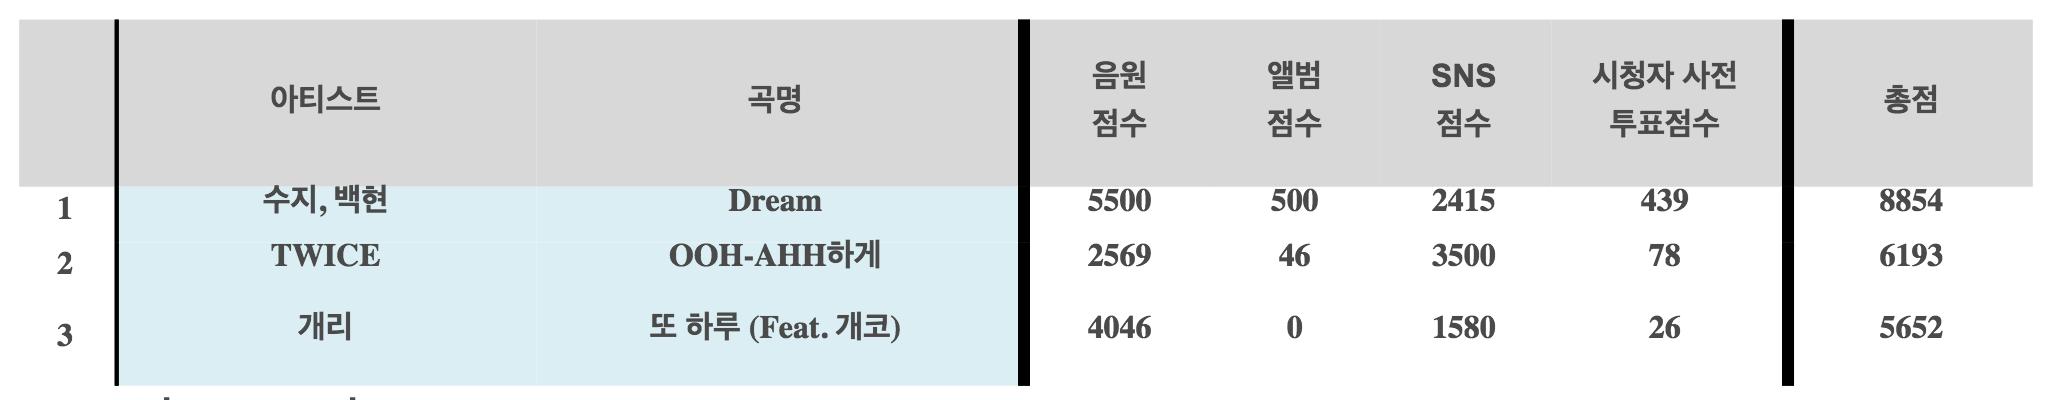 suzy baekhyun inkigayo win chart